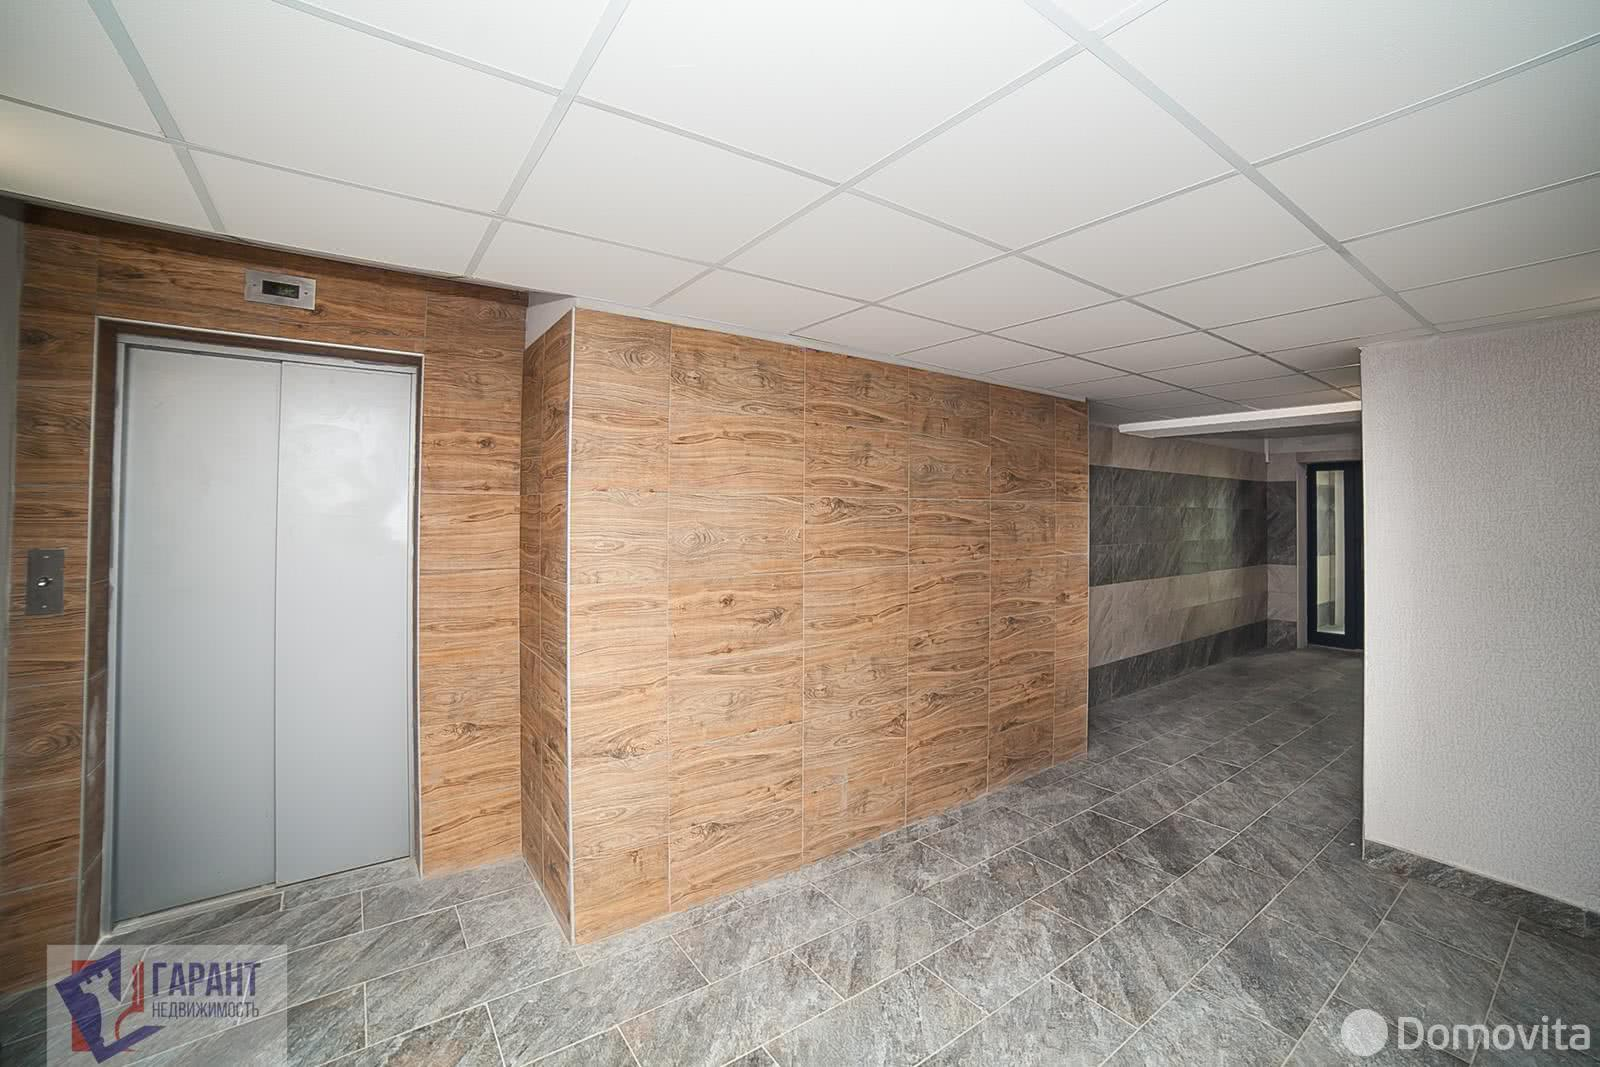 Купить 1-комнатную квартиру в Минске, пер. Зубачева 3-й, д. 5 - фото 6